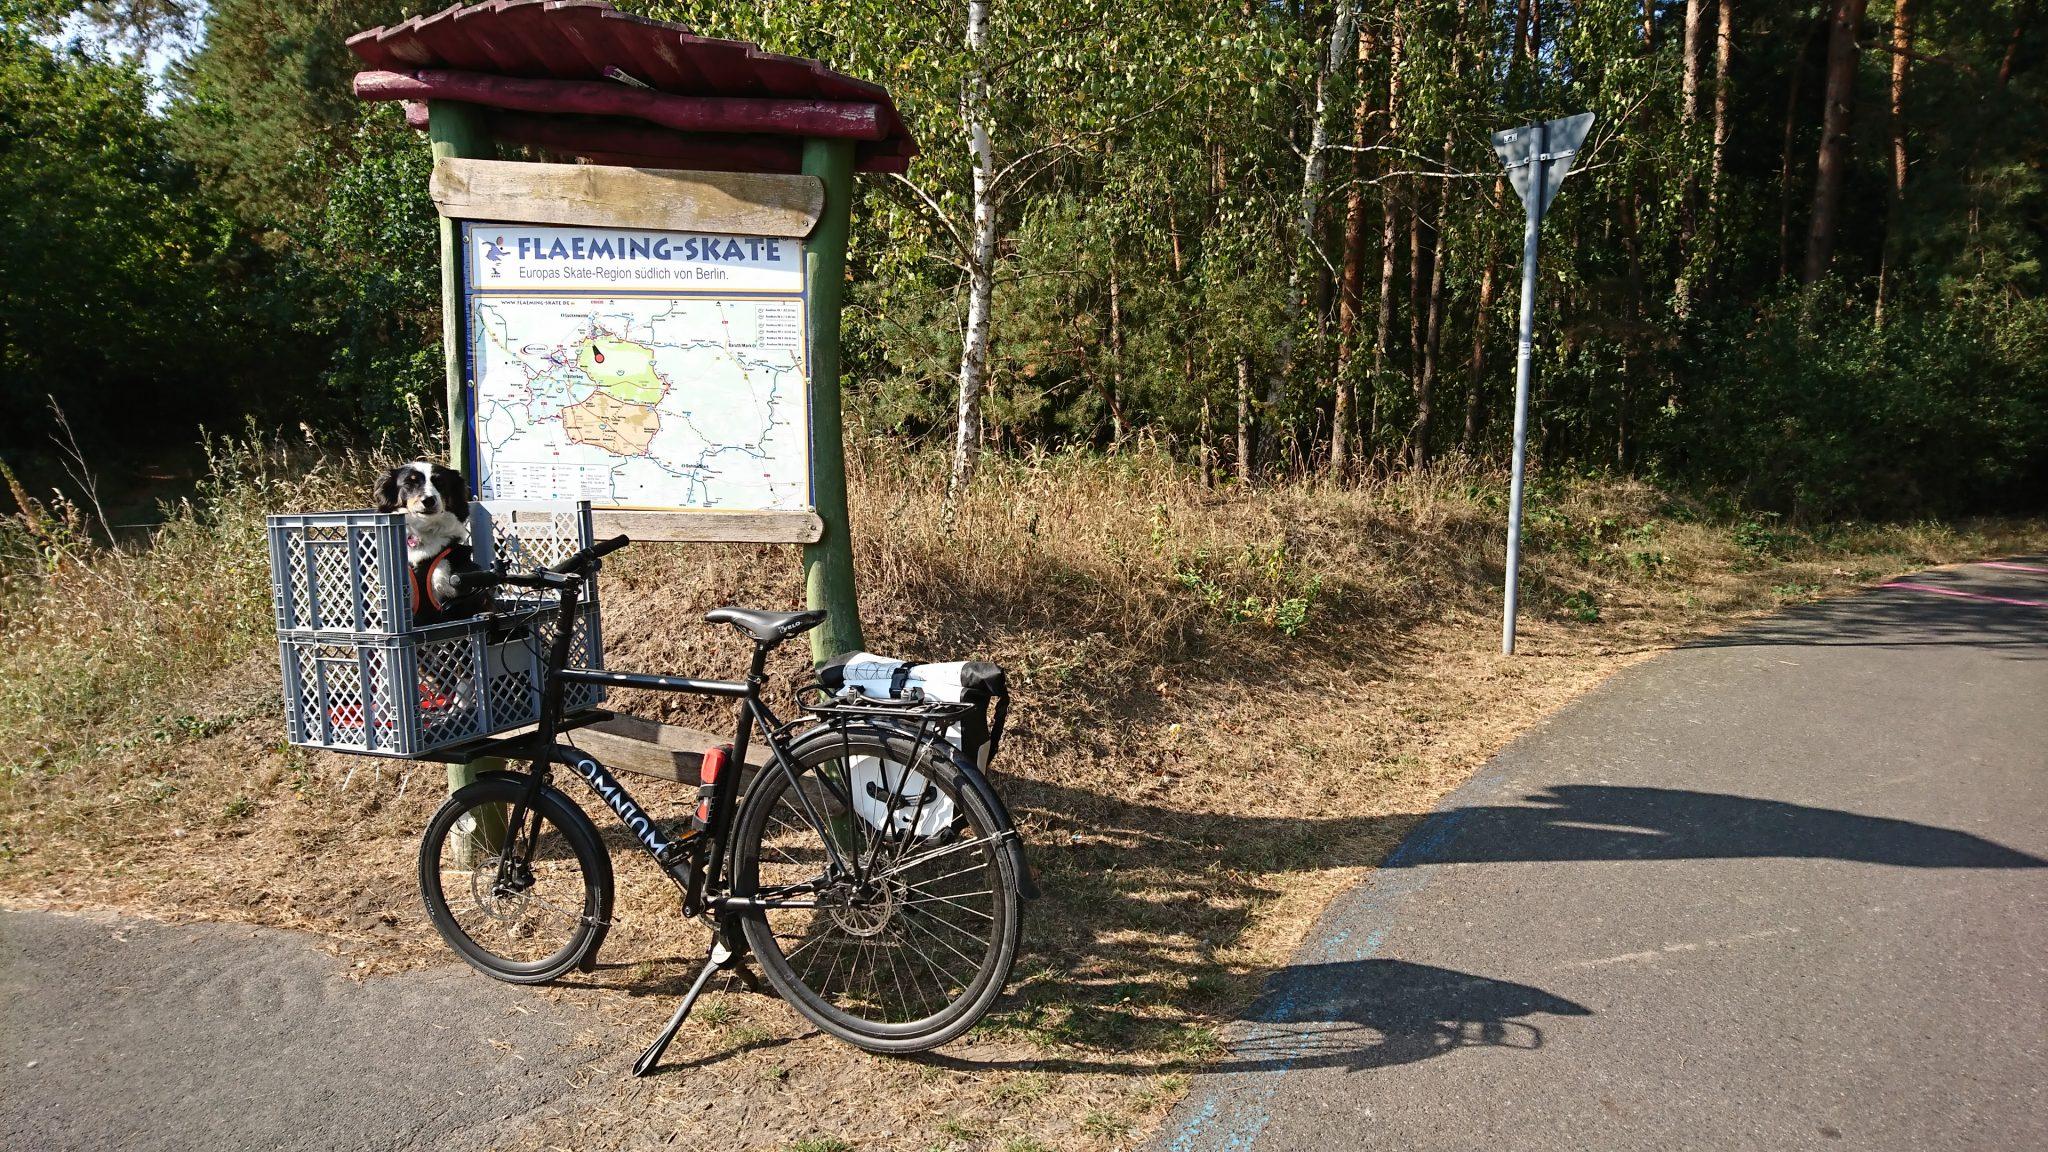 Fahrradtour FlaemingSkate Hund im Fahrradkorb vor Wegweiser